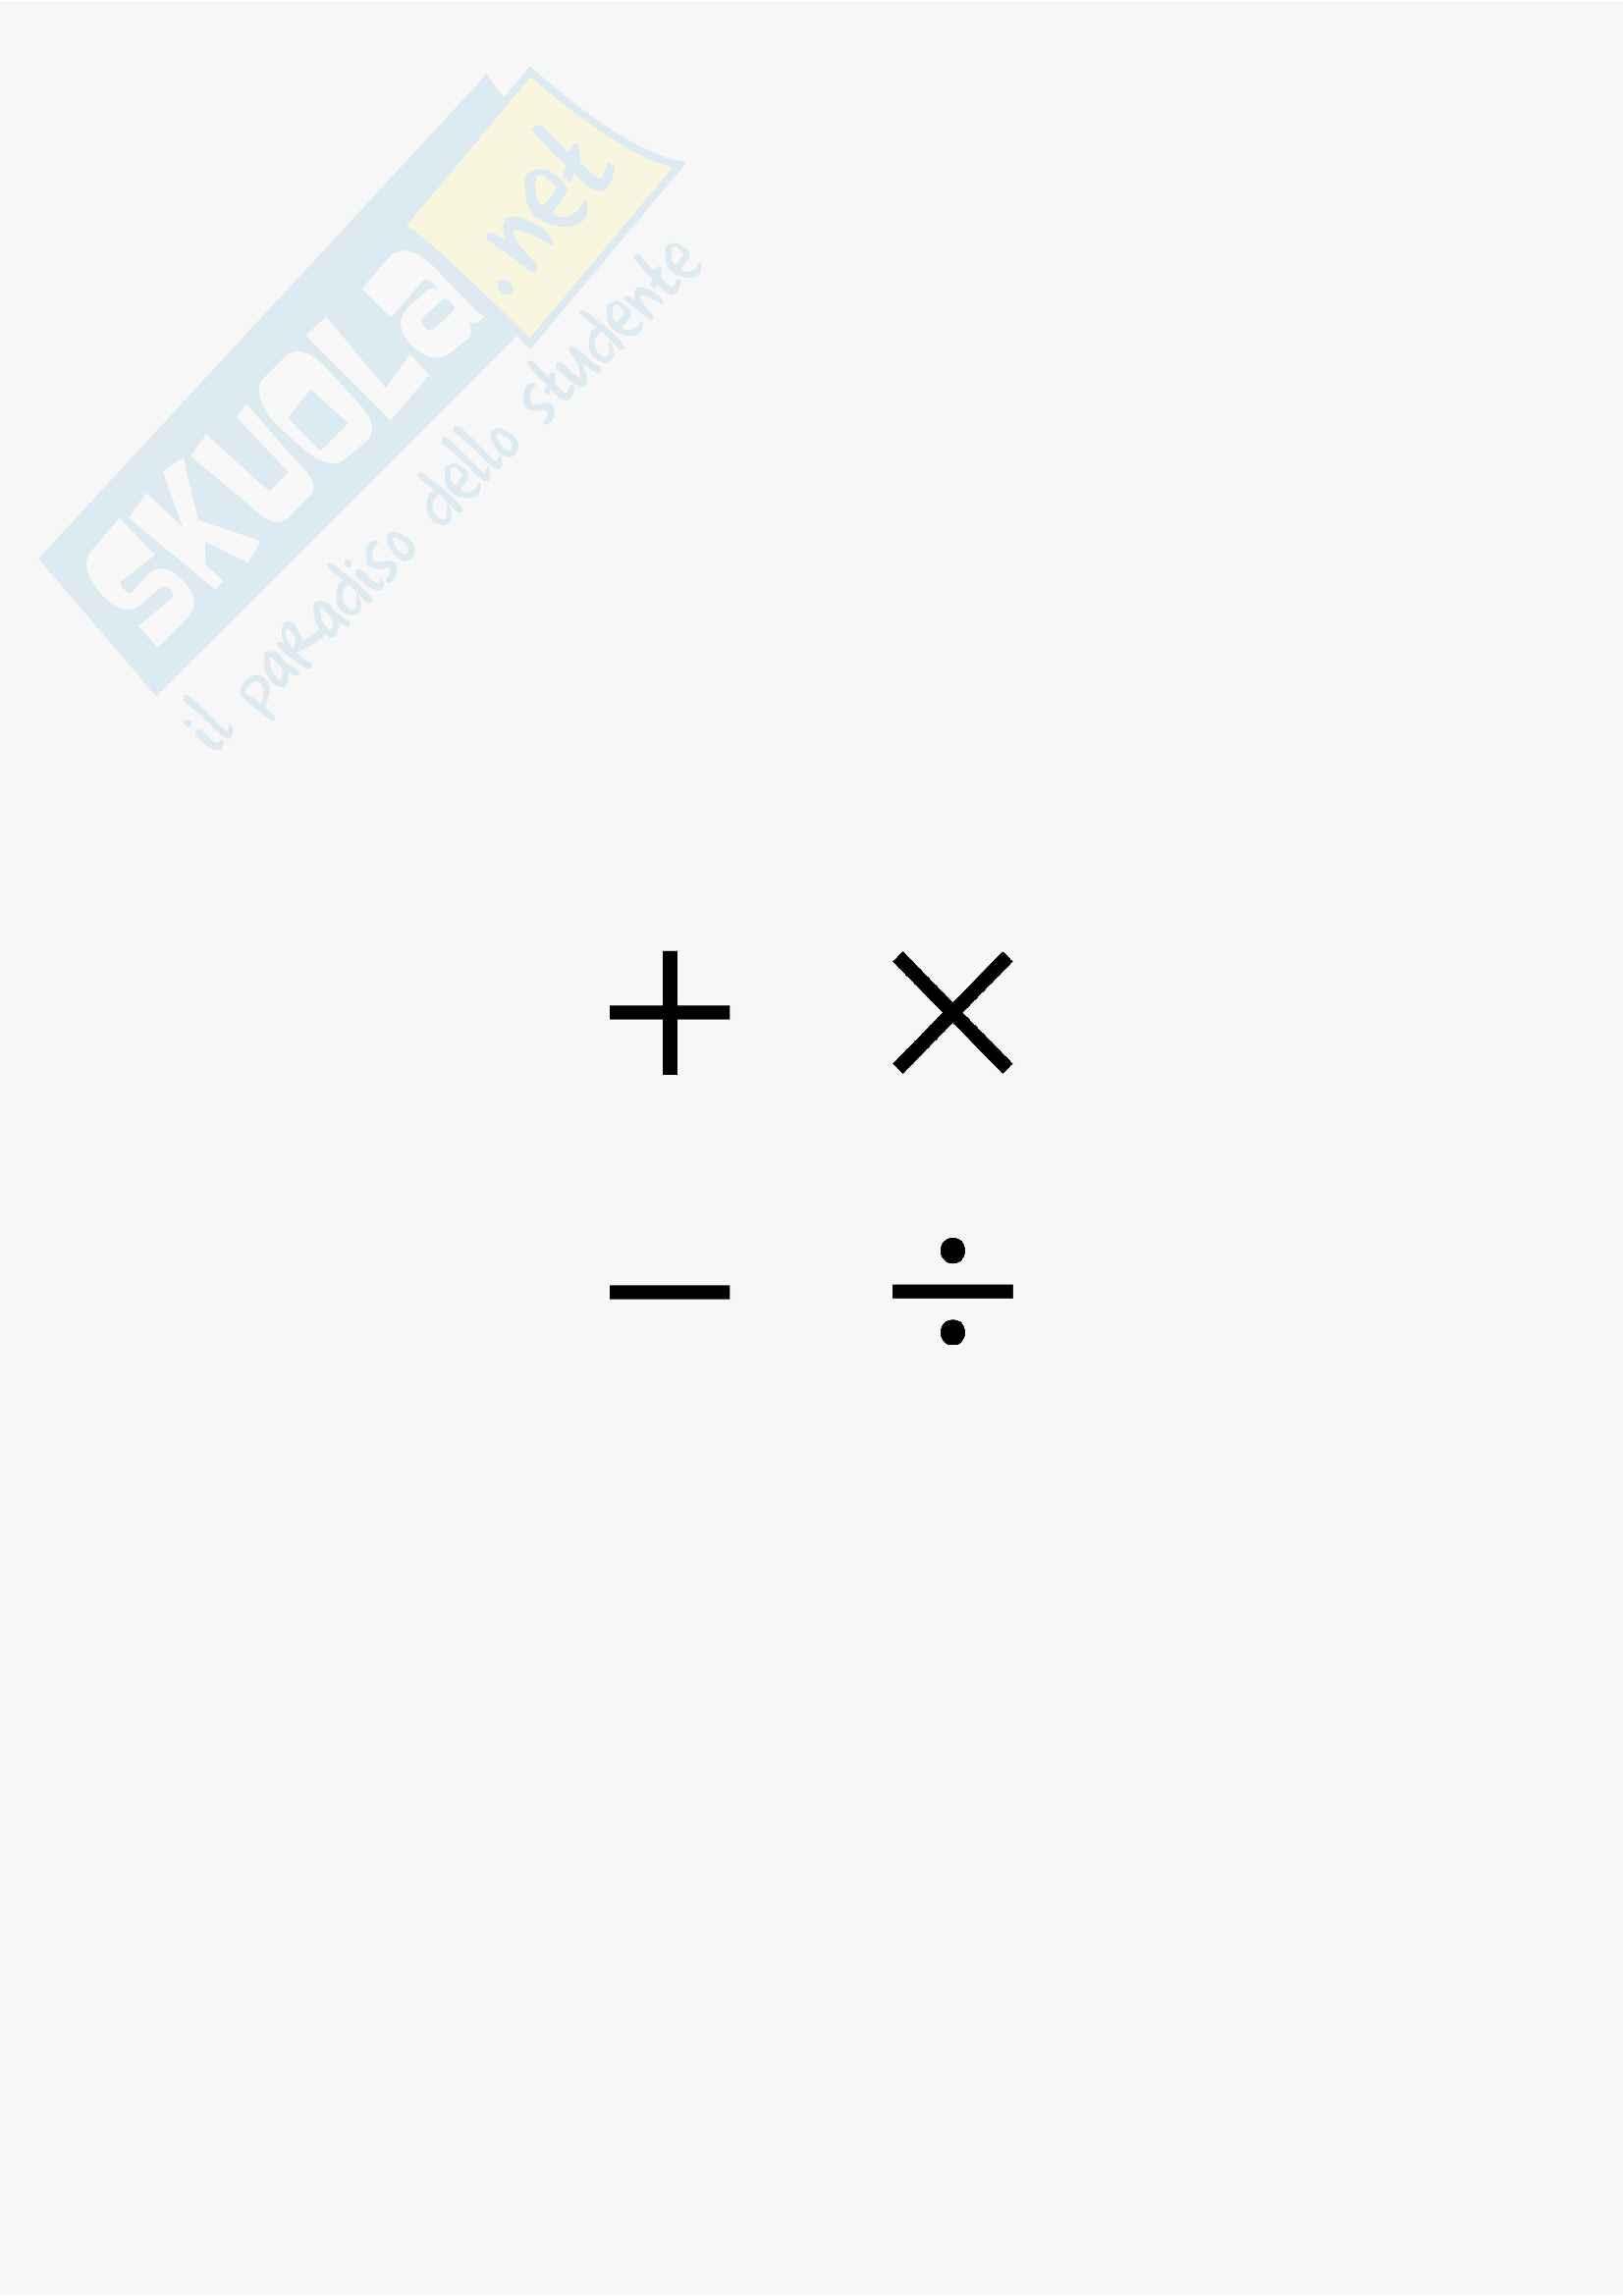 Formulario Analisi 1 e 2